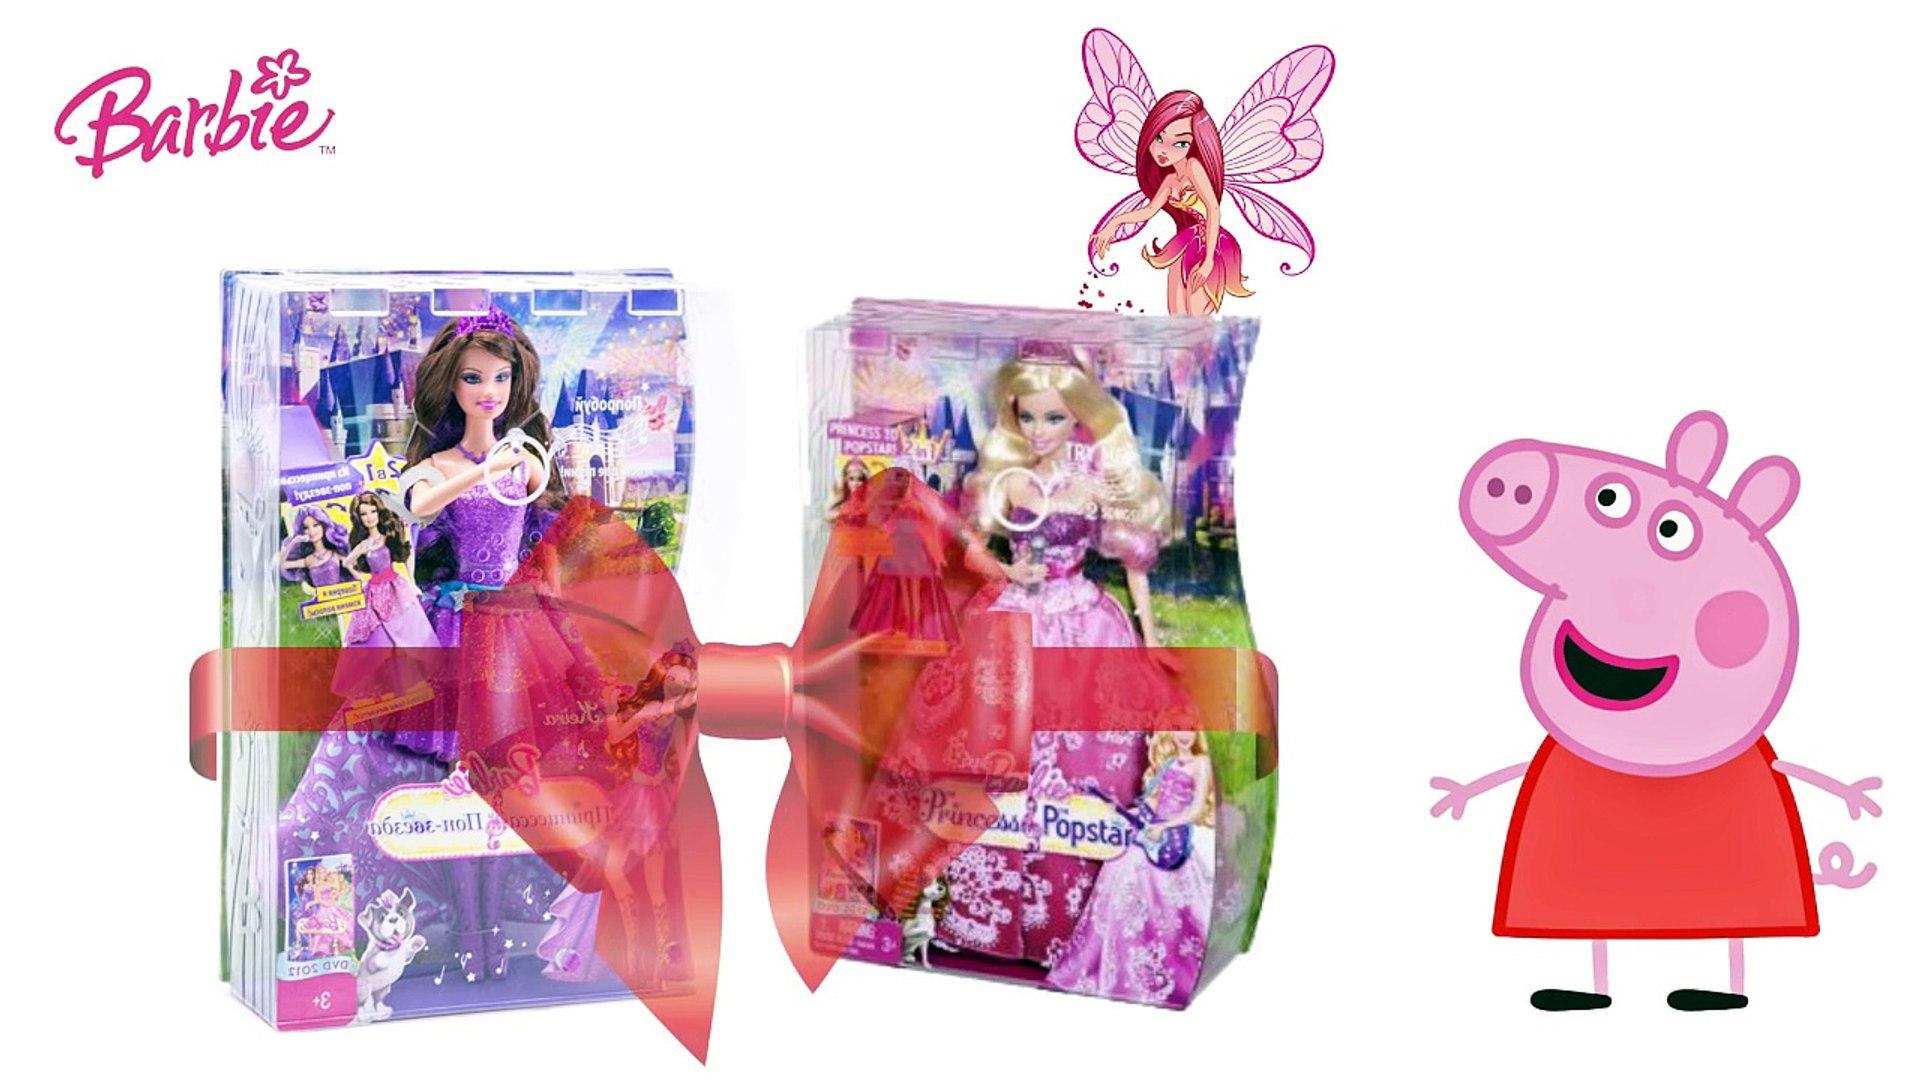 Барби принцесса и поп звезда Свинка Пеппа Peppa Pig Барби и волшебство Новые куклы